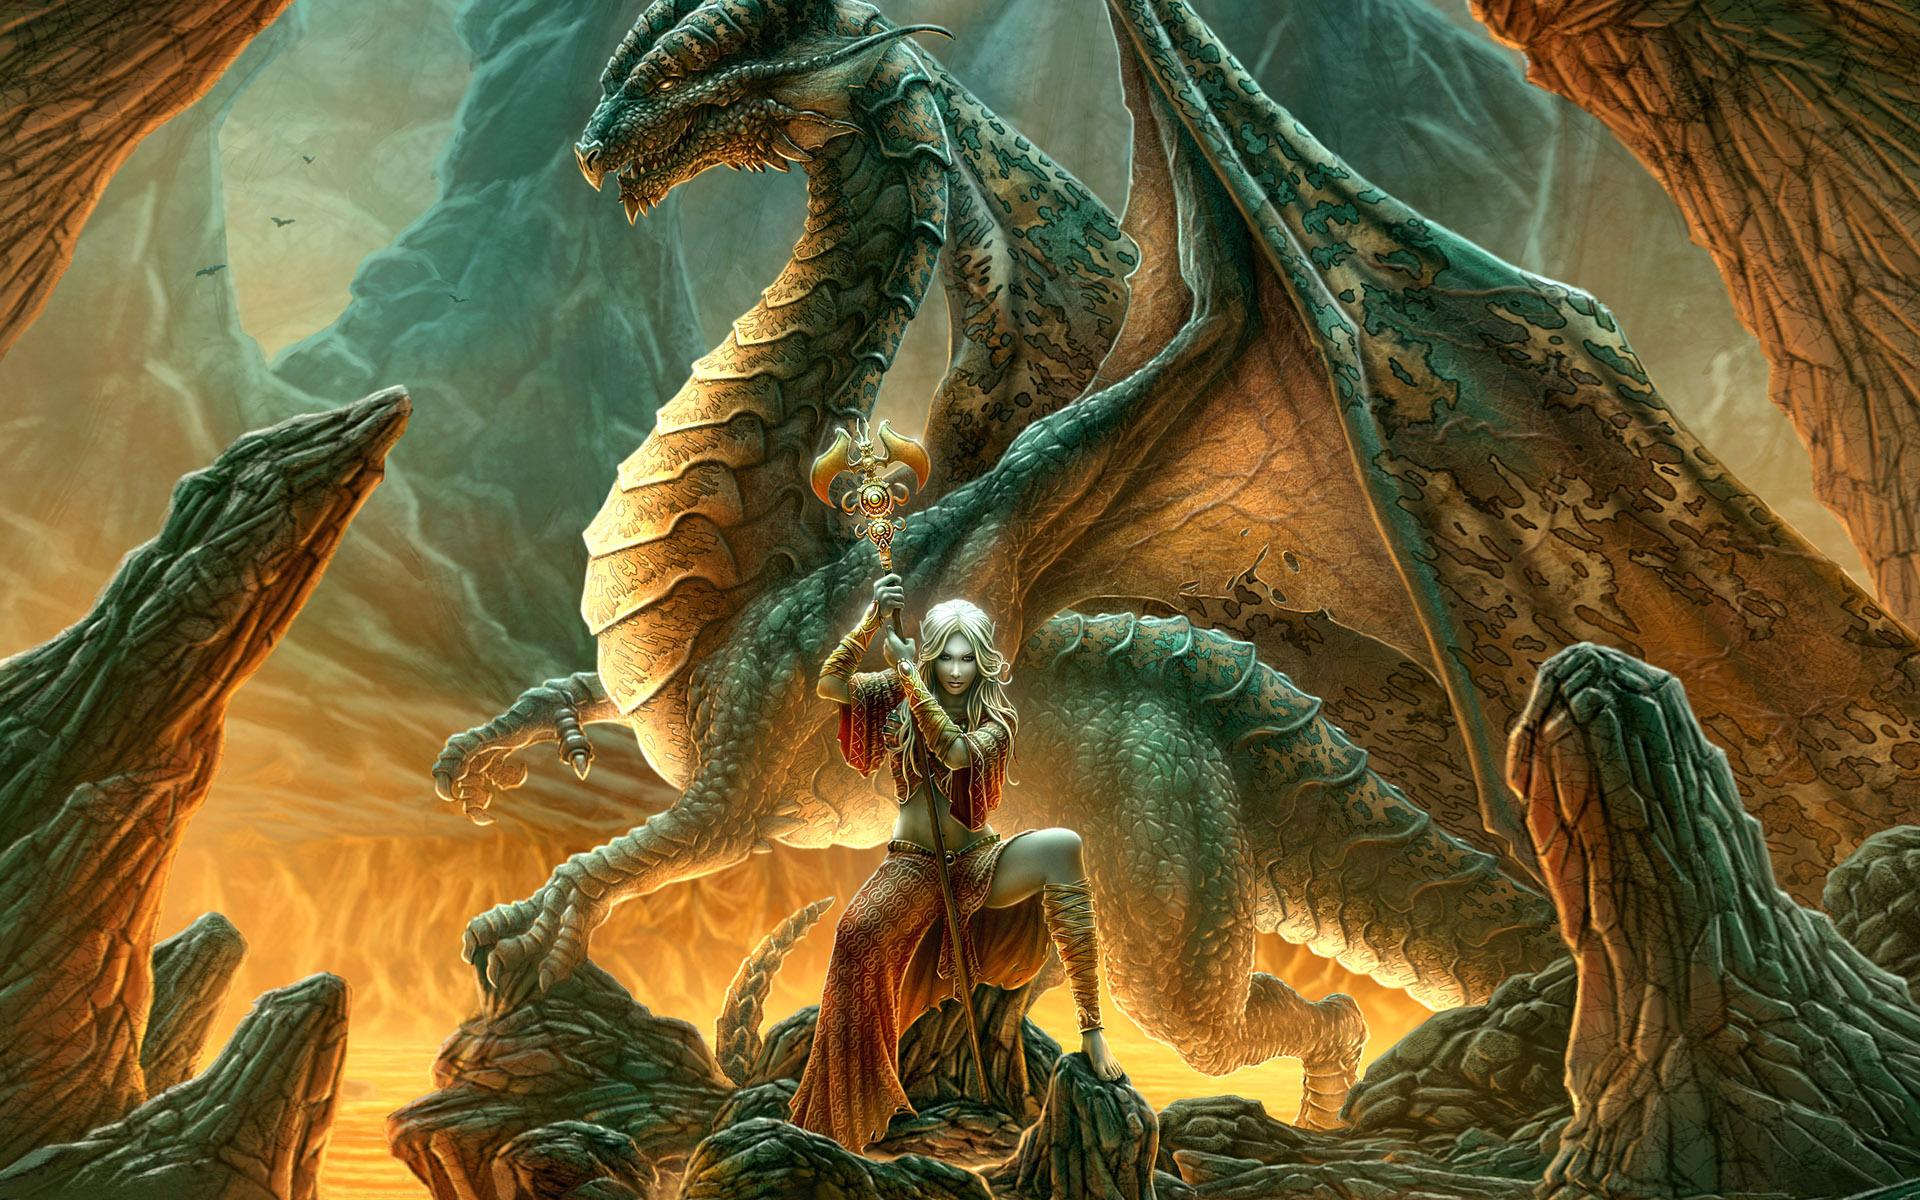 free desktop wallpaper of fantasy warrior princess and dragon 1920x1200